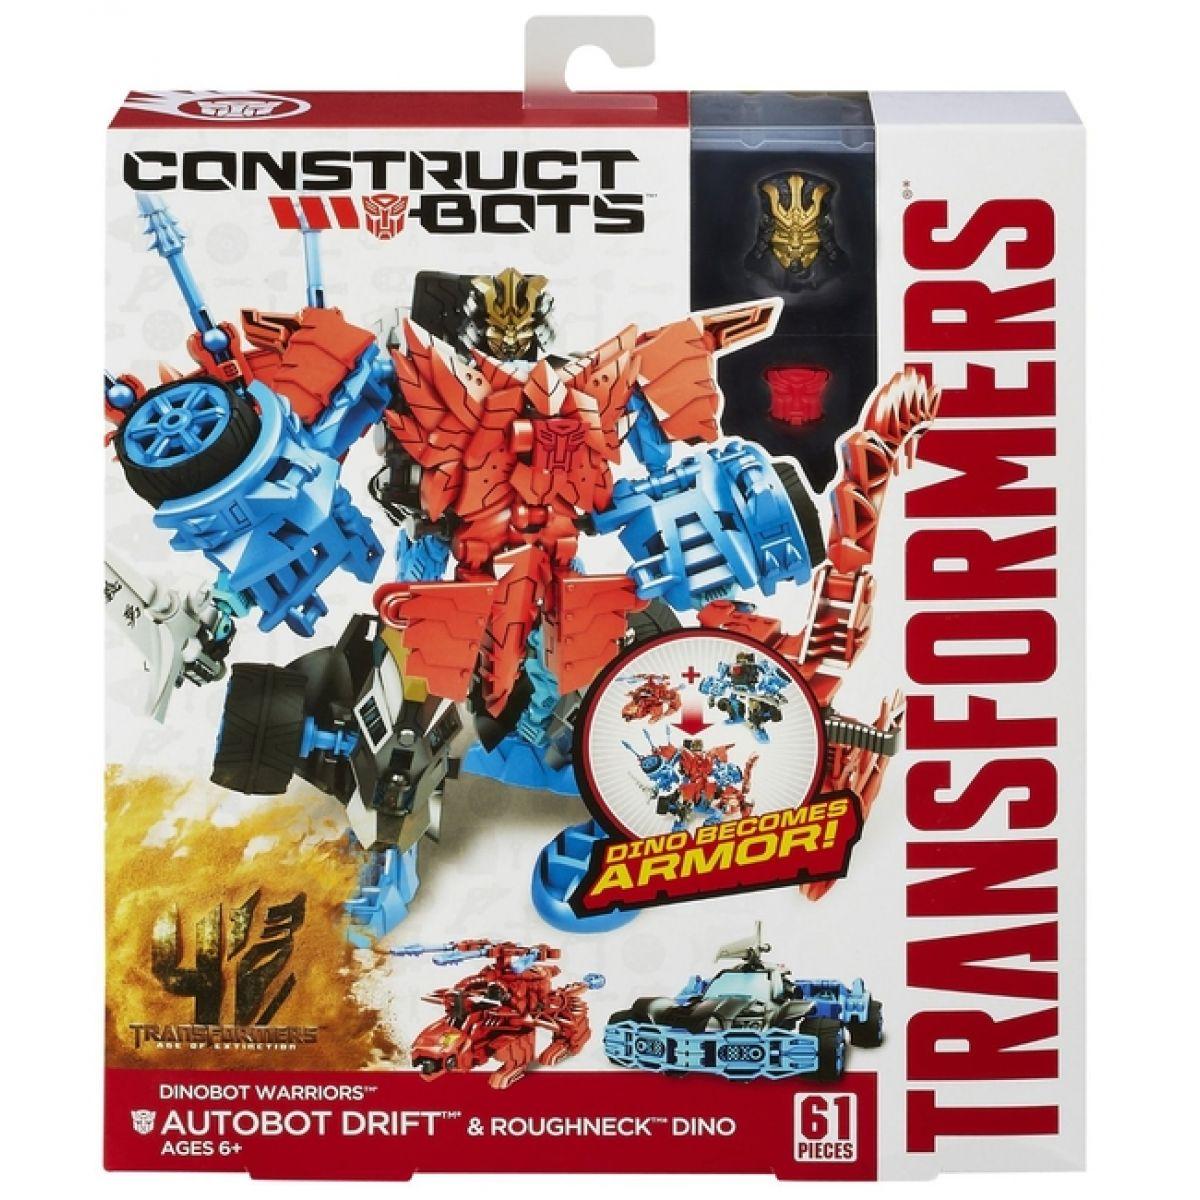 Hasbro Transformers 4 Construct Bots Autobot Drift a Rougneck Dino #3